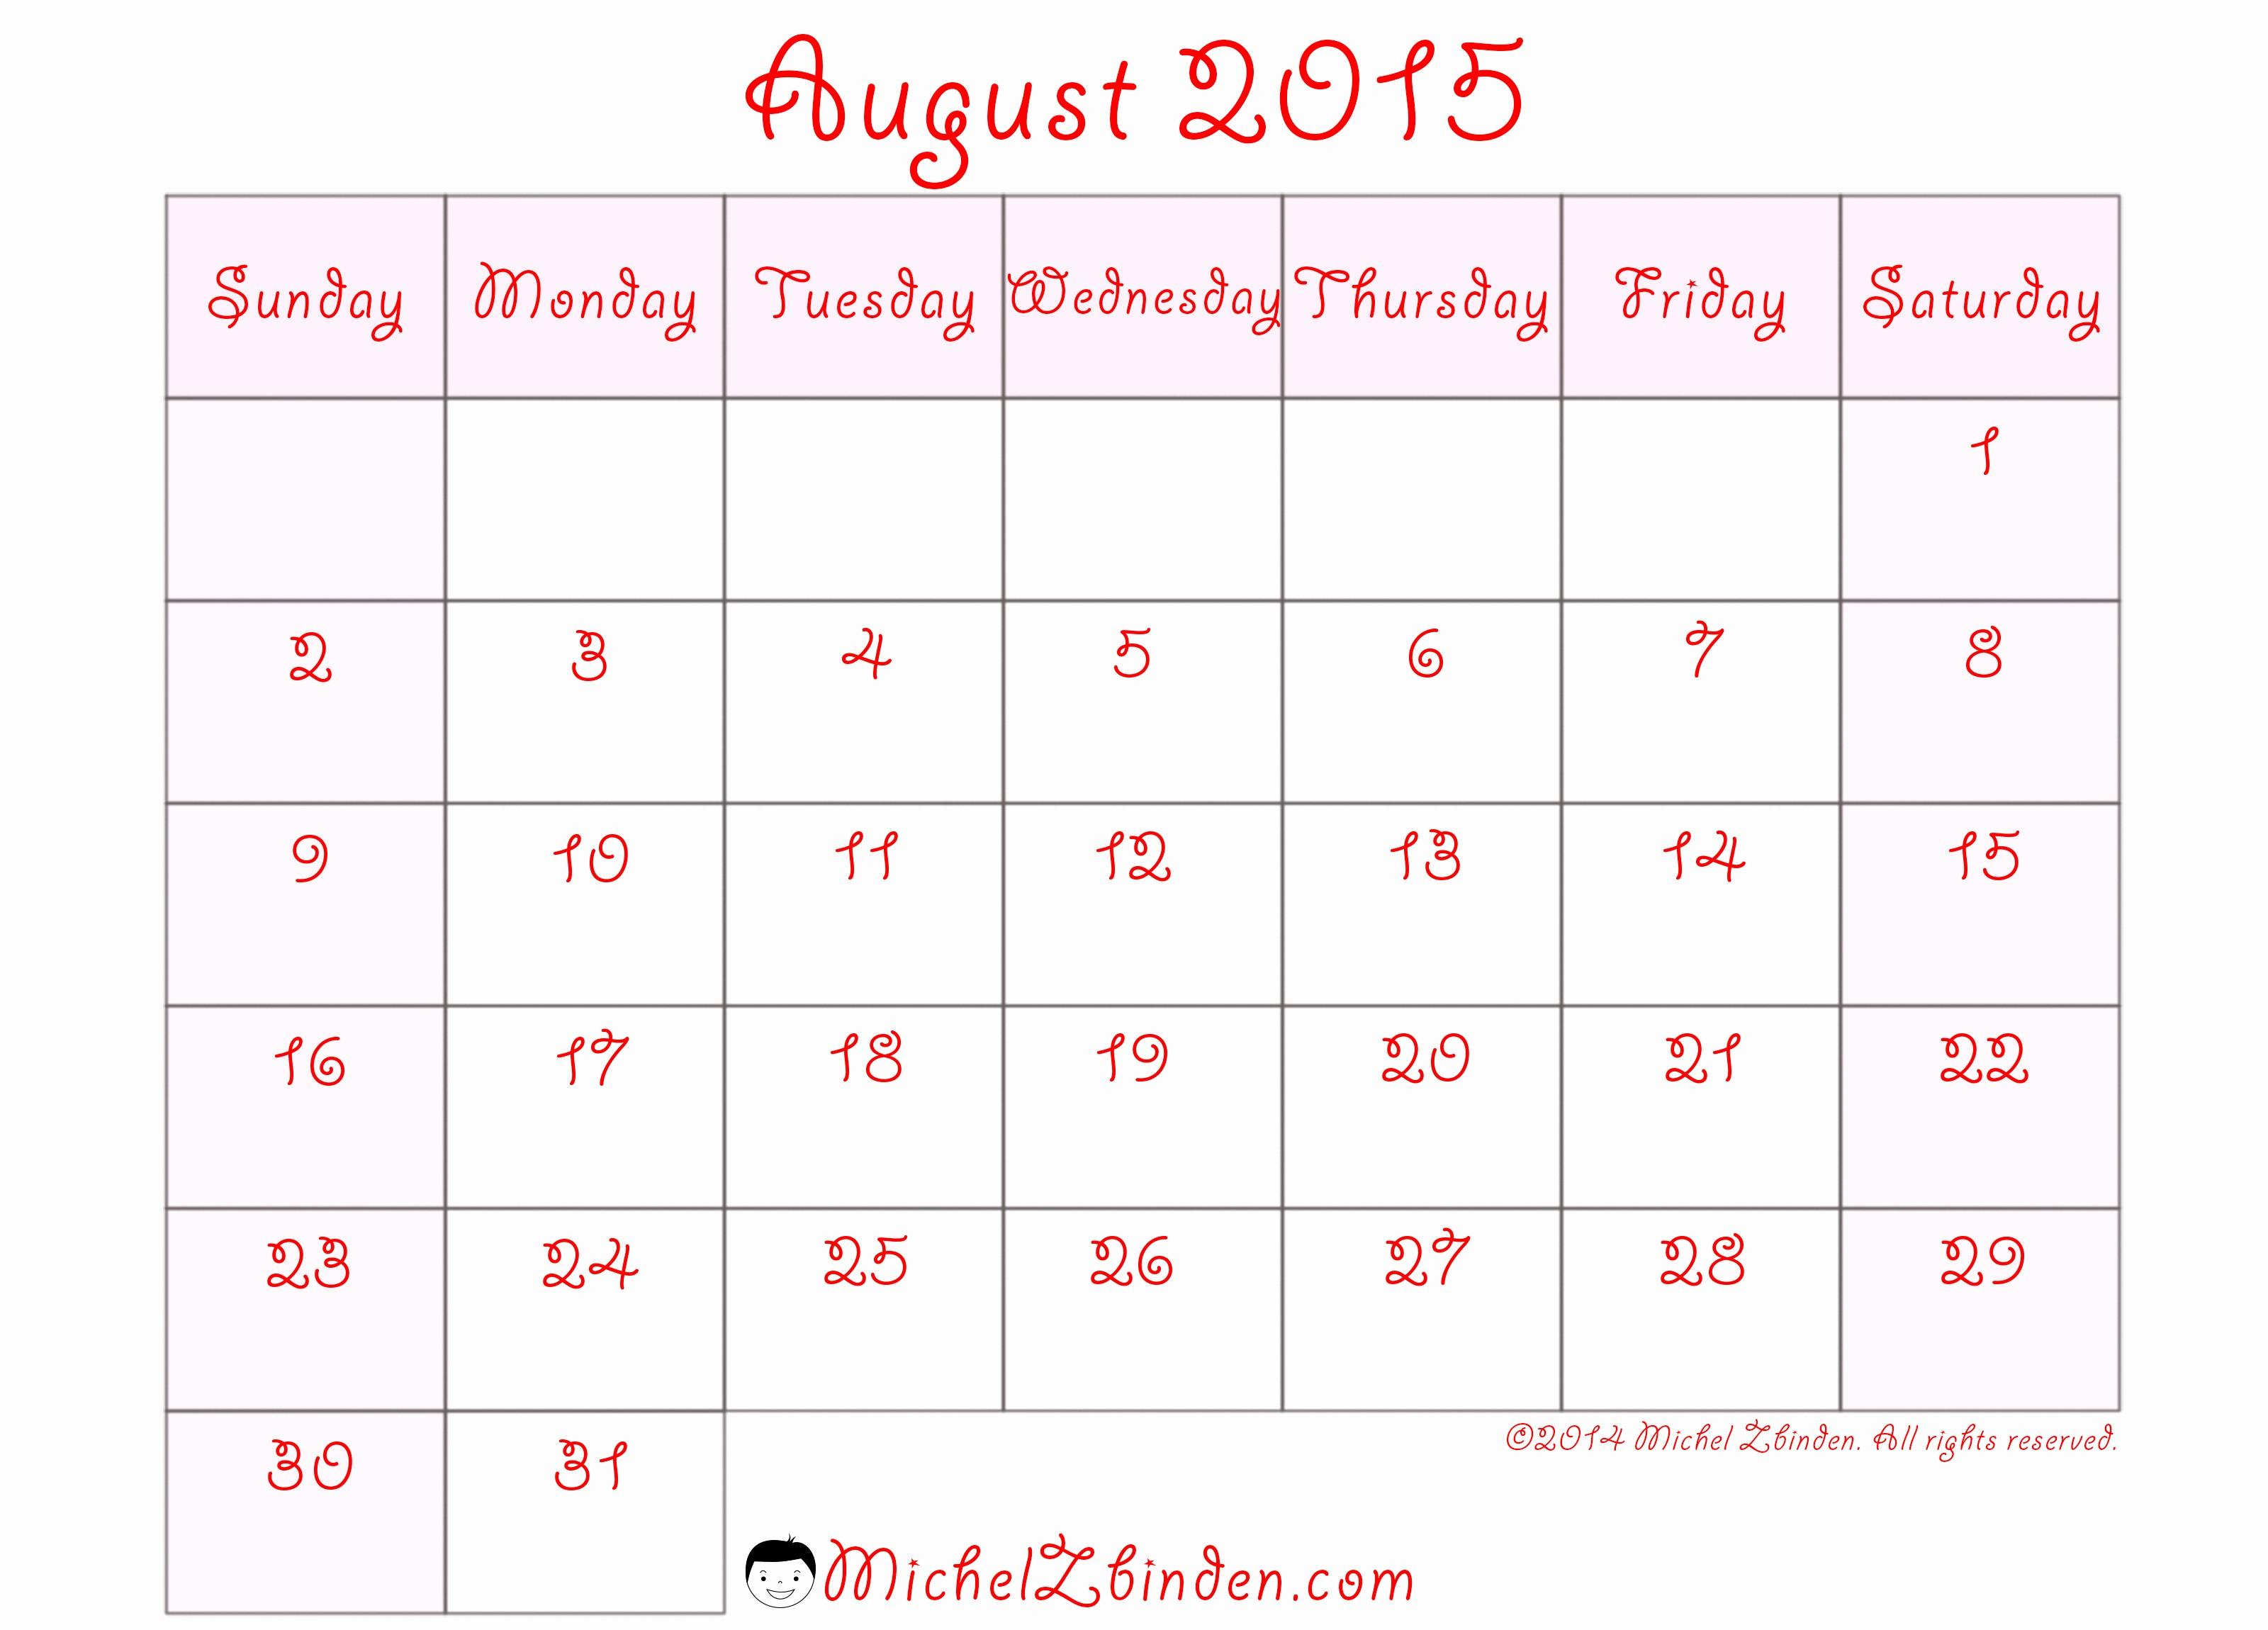 Free Calendar Templates August 2015 Lovely 8 Best Of Printable August 2015 Calendar Week